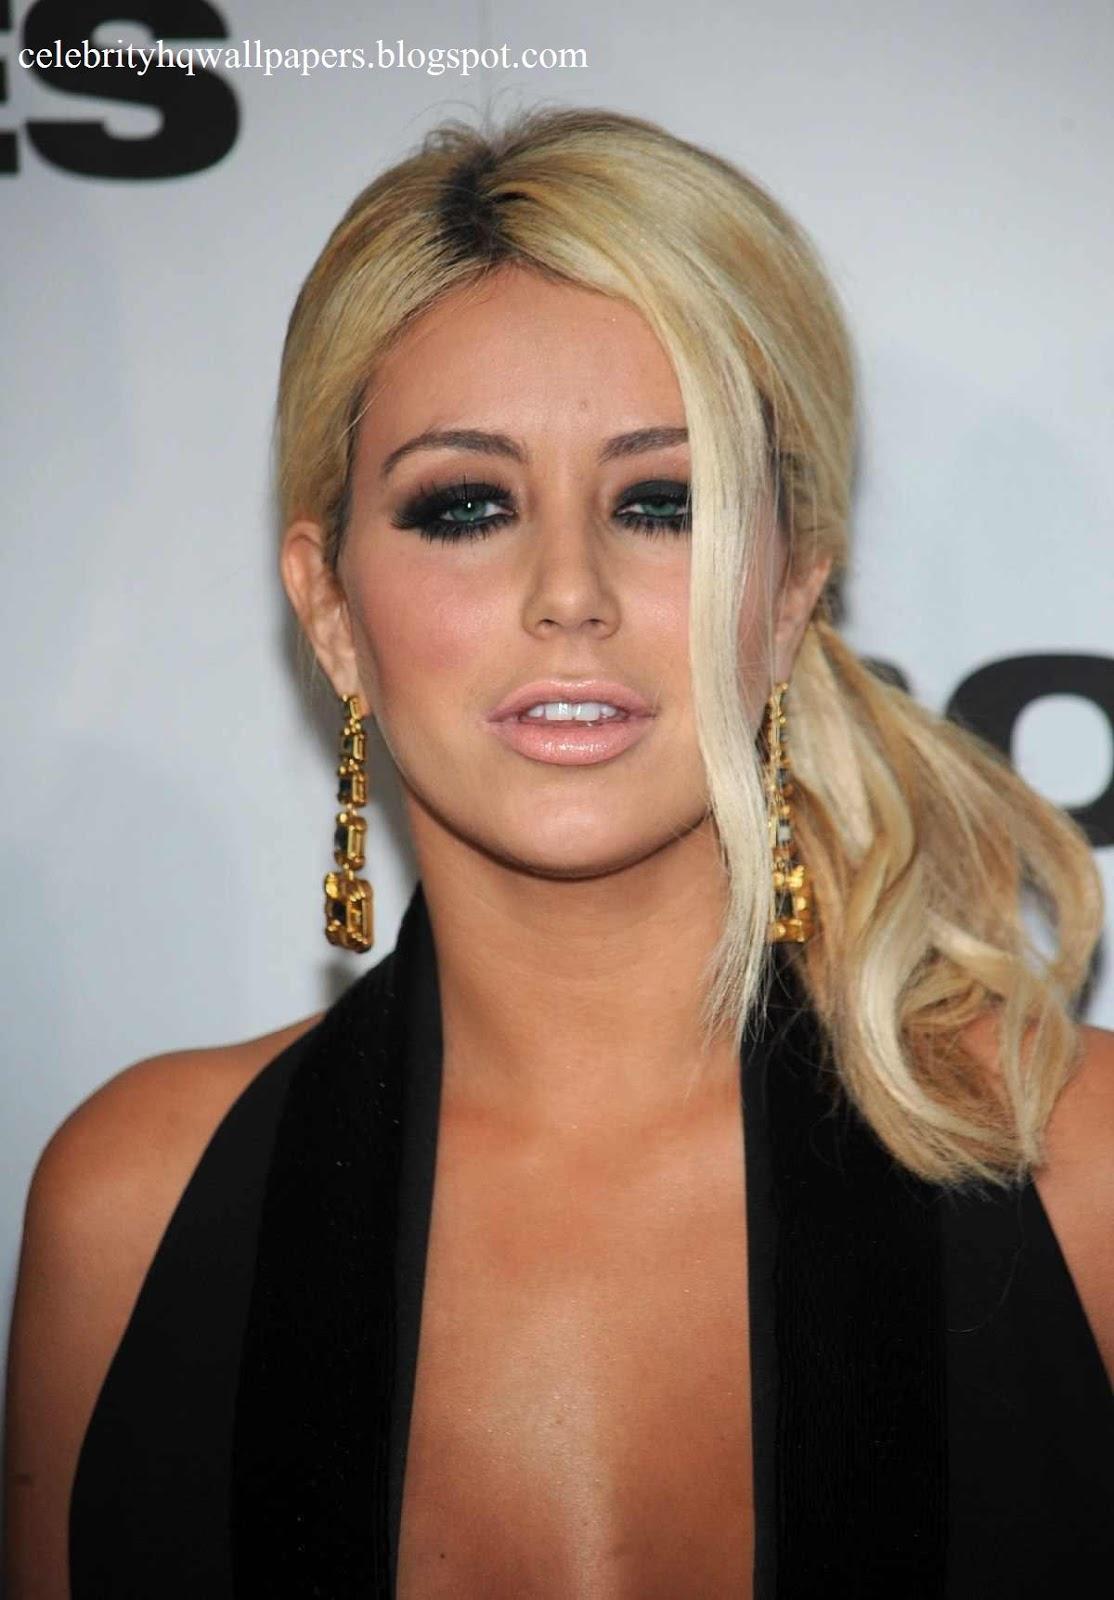 People top 25 celebrity hot list